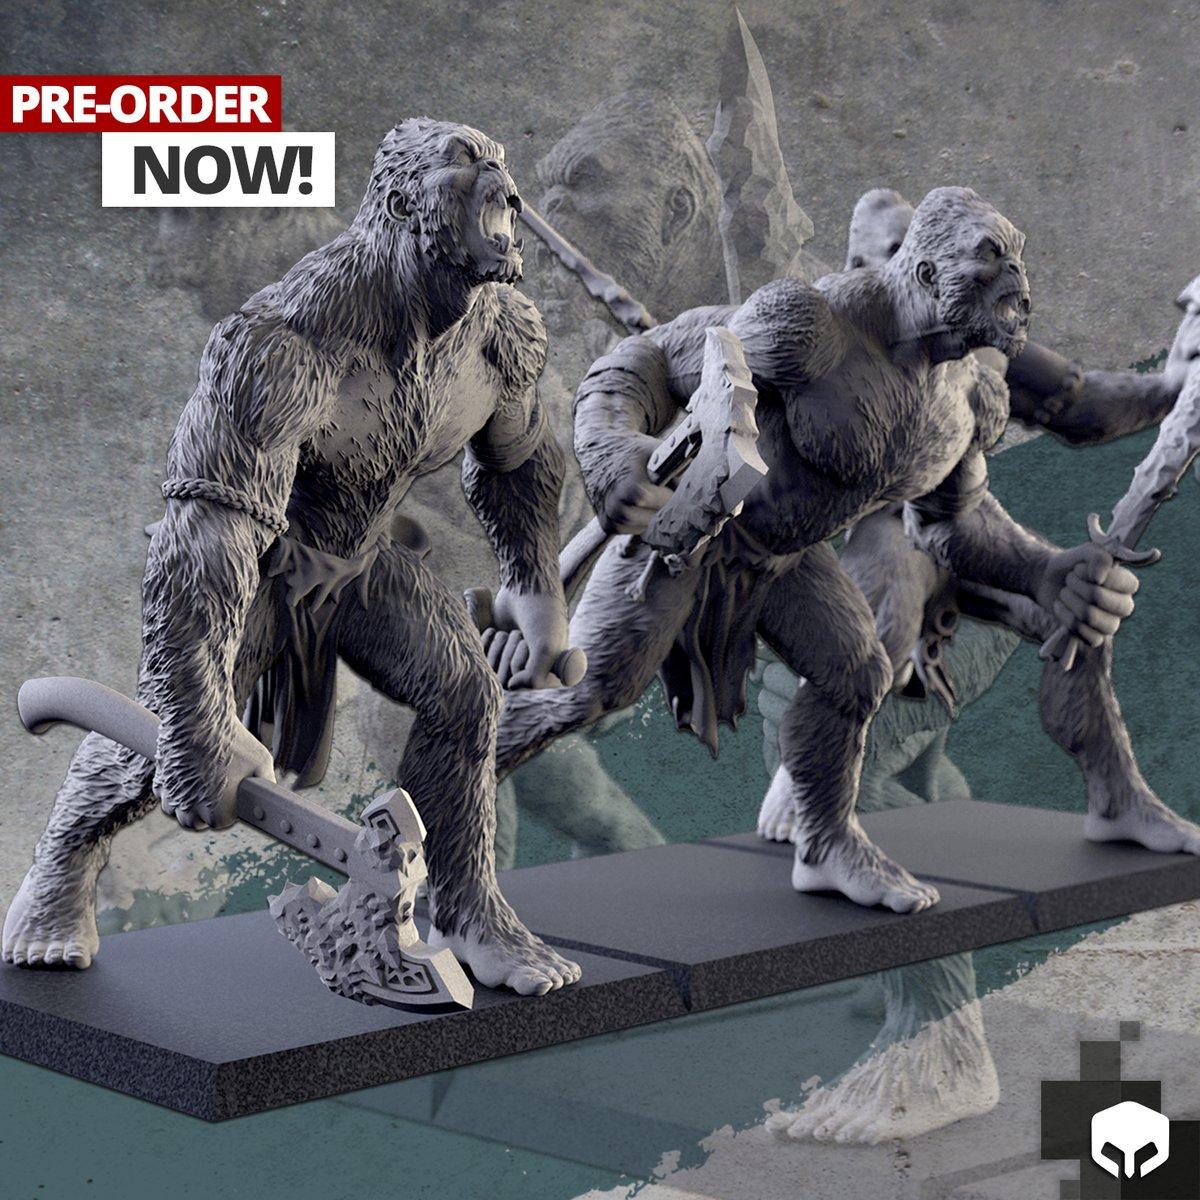 Yetis! Pre Order now! https://t.co/FbfmiDOzKs  #warhammer #warhammer40k #bloodbowl #ogre #GW #9th #theninthage #miniatures #warhammerreforged #aos #ageofsigmar #warhammerfantasy #ogrekingdoms #ogrekhans #gorger #kineater #yetis #paintingwarhammer #ogres #wow https://t.co/xR5I69129X